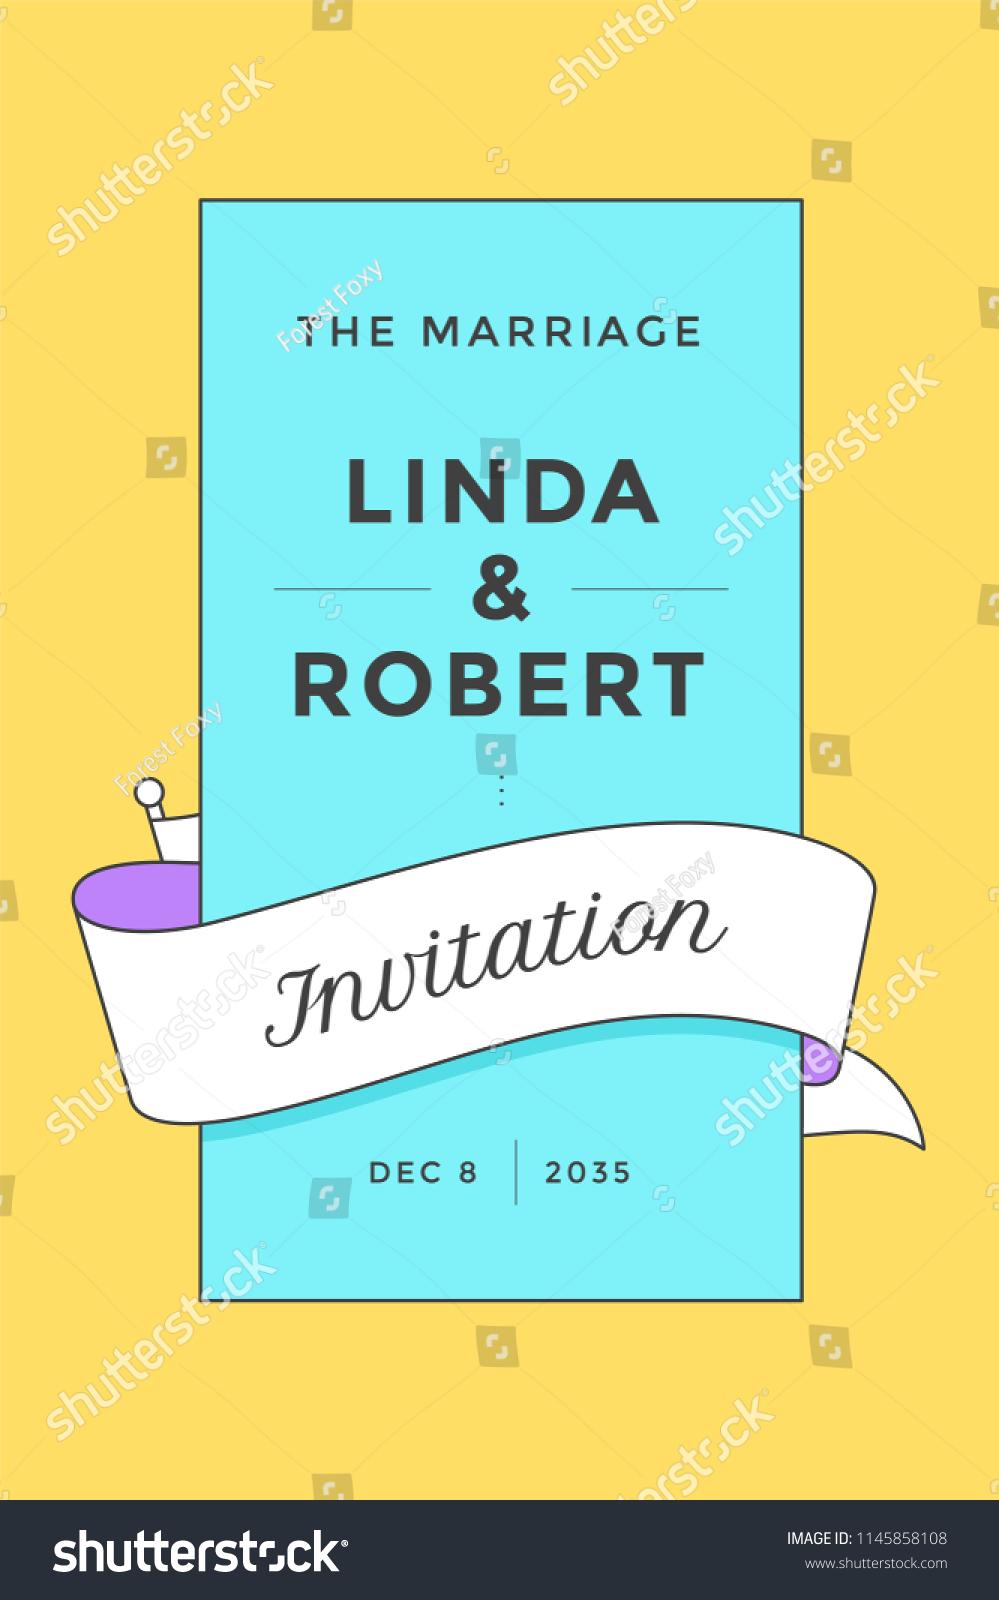 Wedding Invitation Vintage Wedding Invitation Marriage Stock Vector